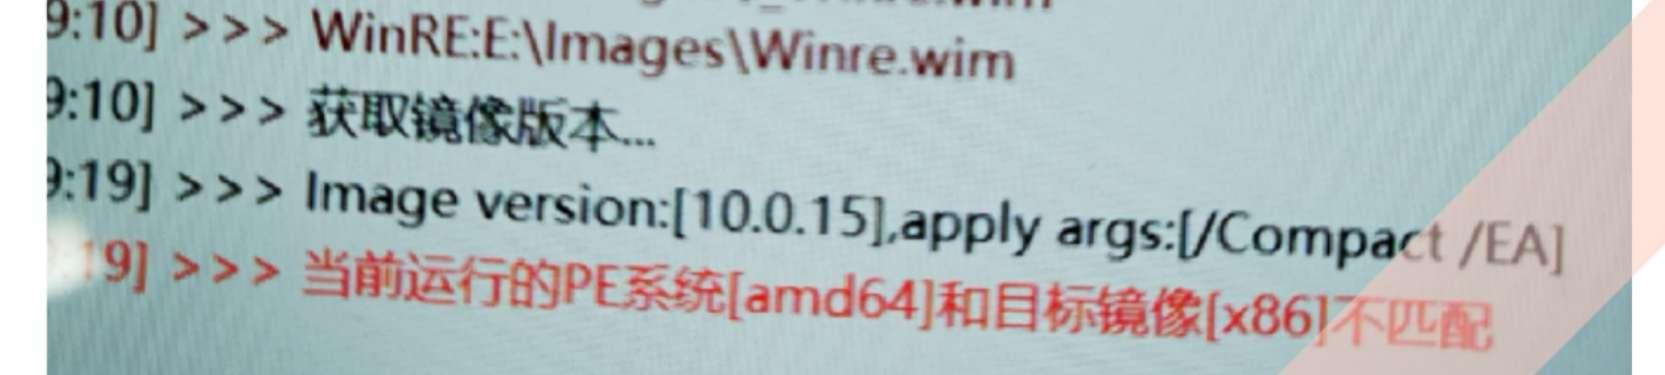 IMG_20200530_101035